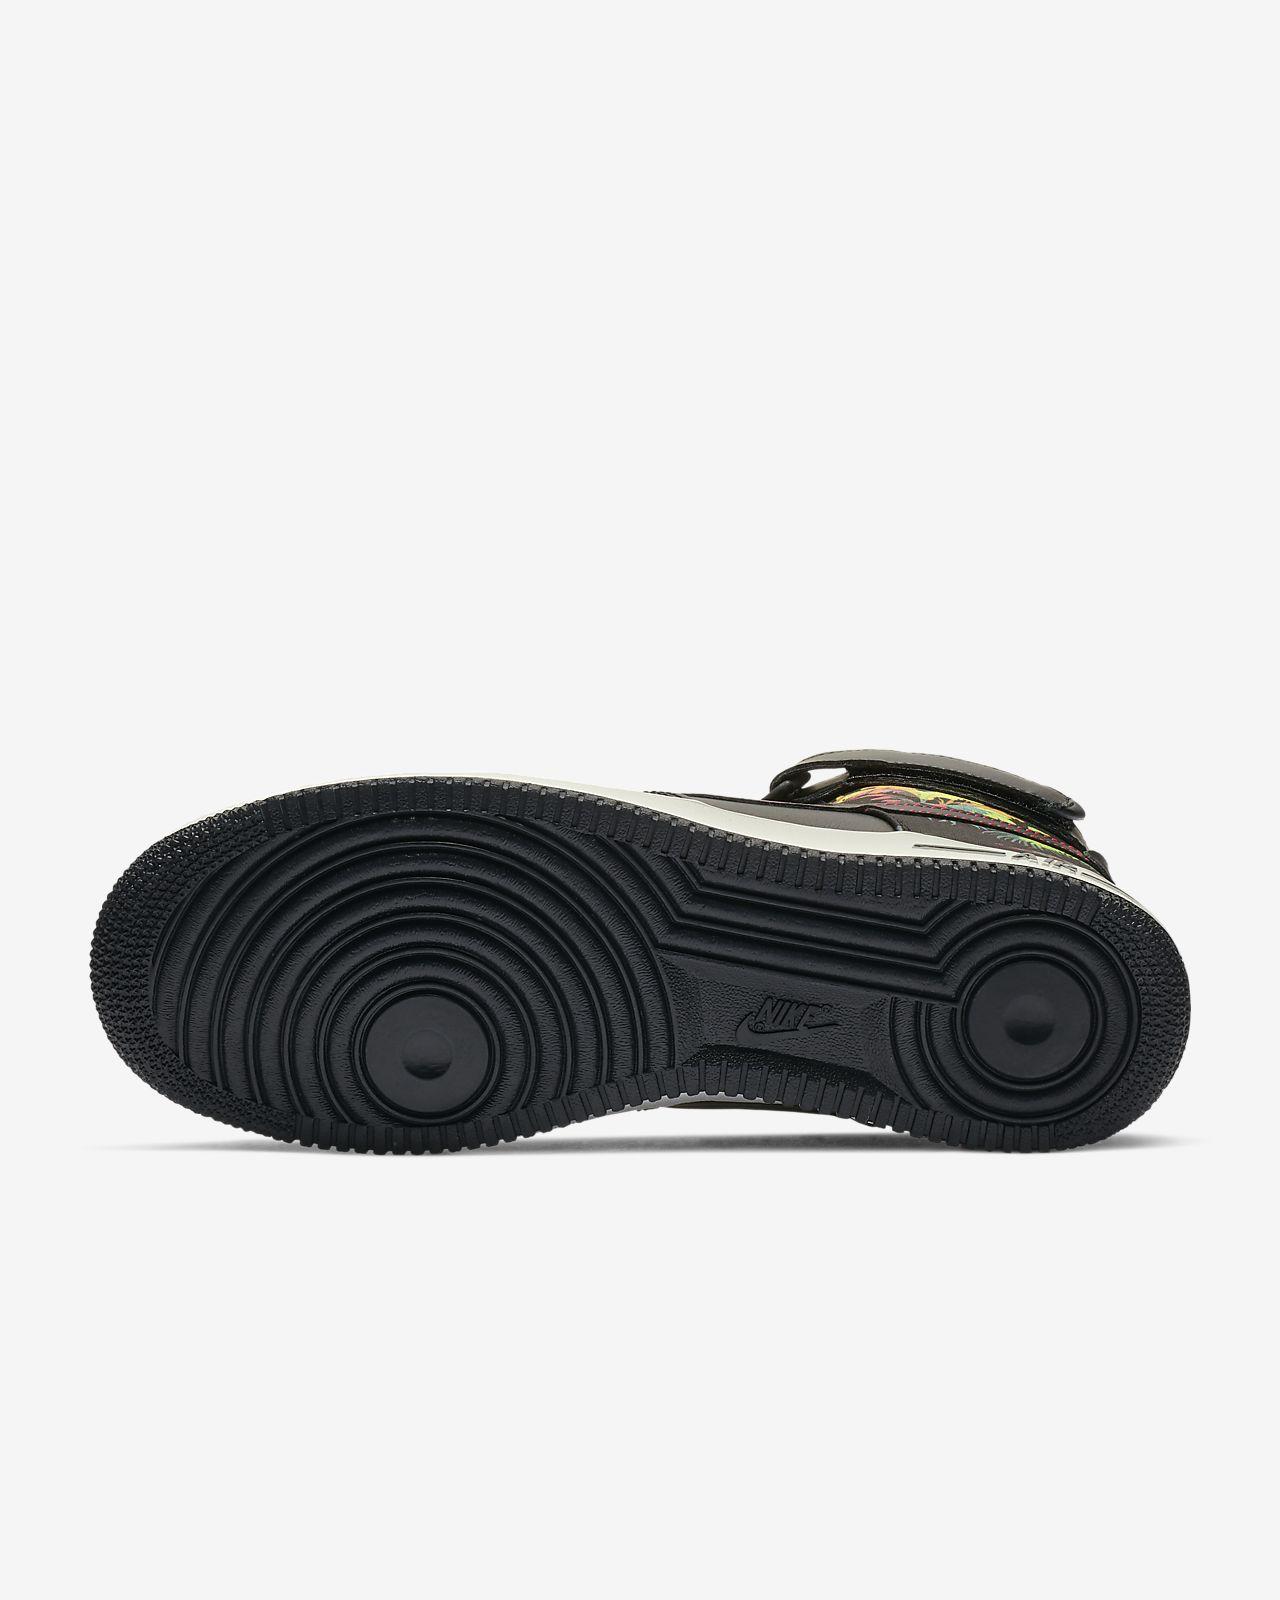 buy online f0e33 2d71e ... Nike Air Force 1 High  07 LV8 Men s Shoe